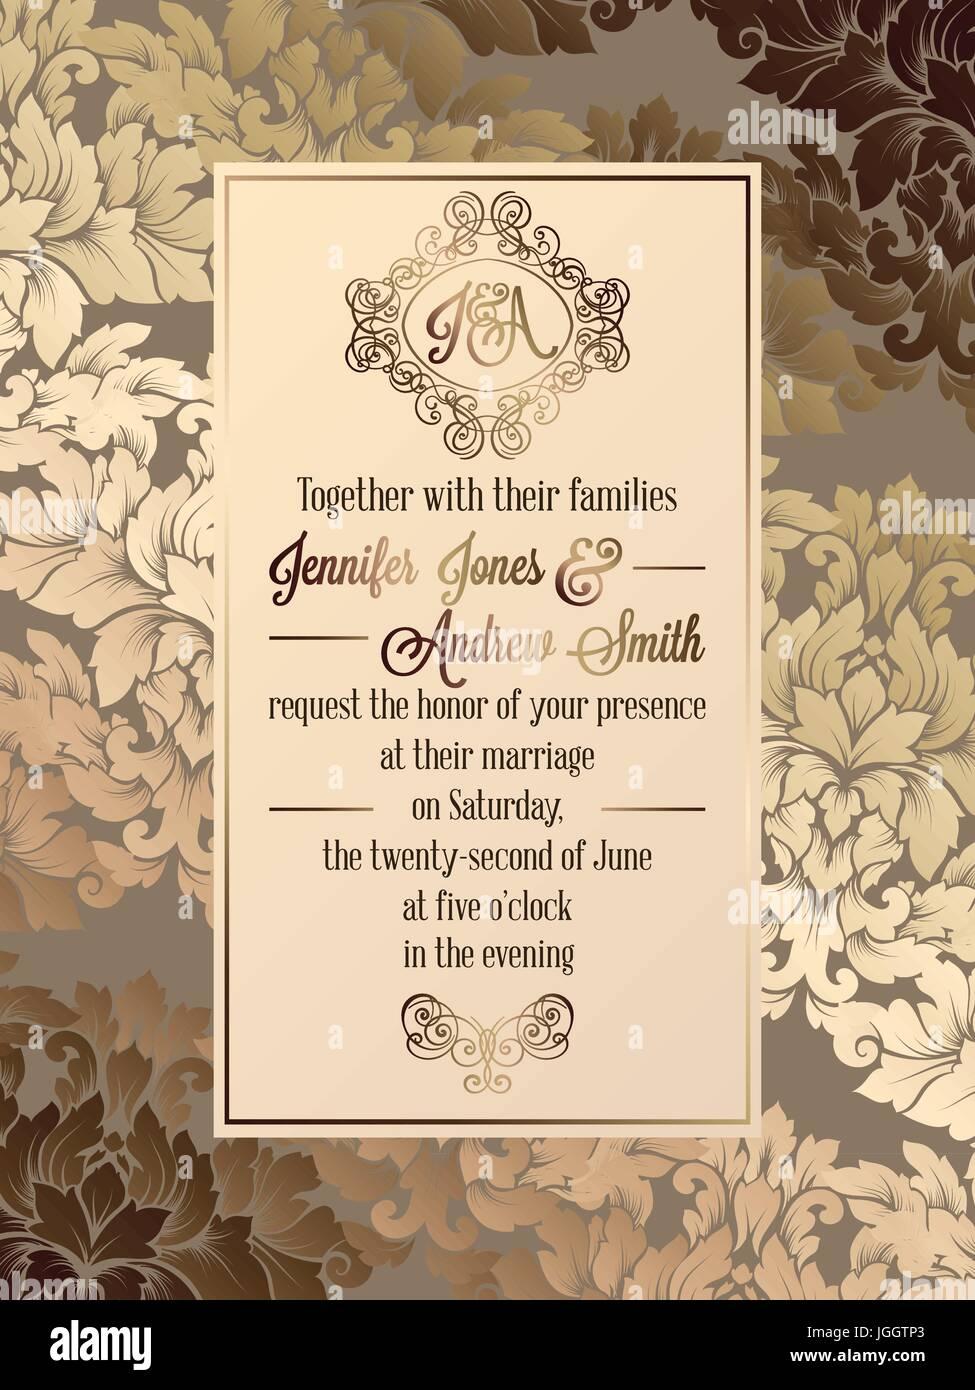 Vintage baroque style wedding invitation card template elegant vintage baroque style wedding invitation card template elegant formal design with damask background traditional decoration for wedding stopboris Gallery